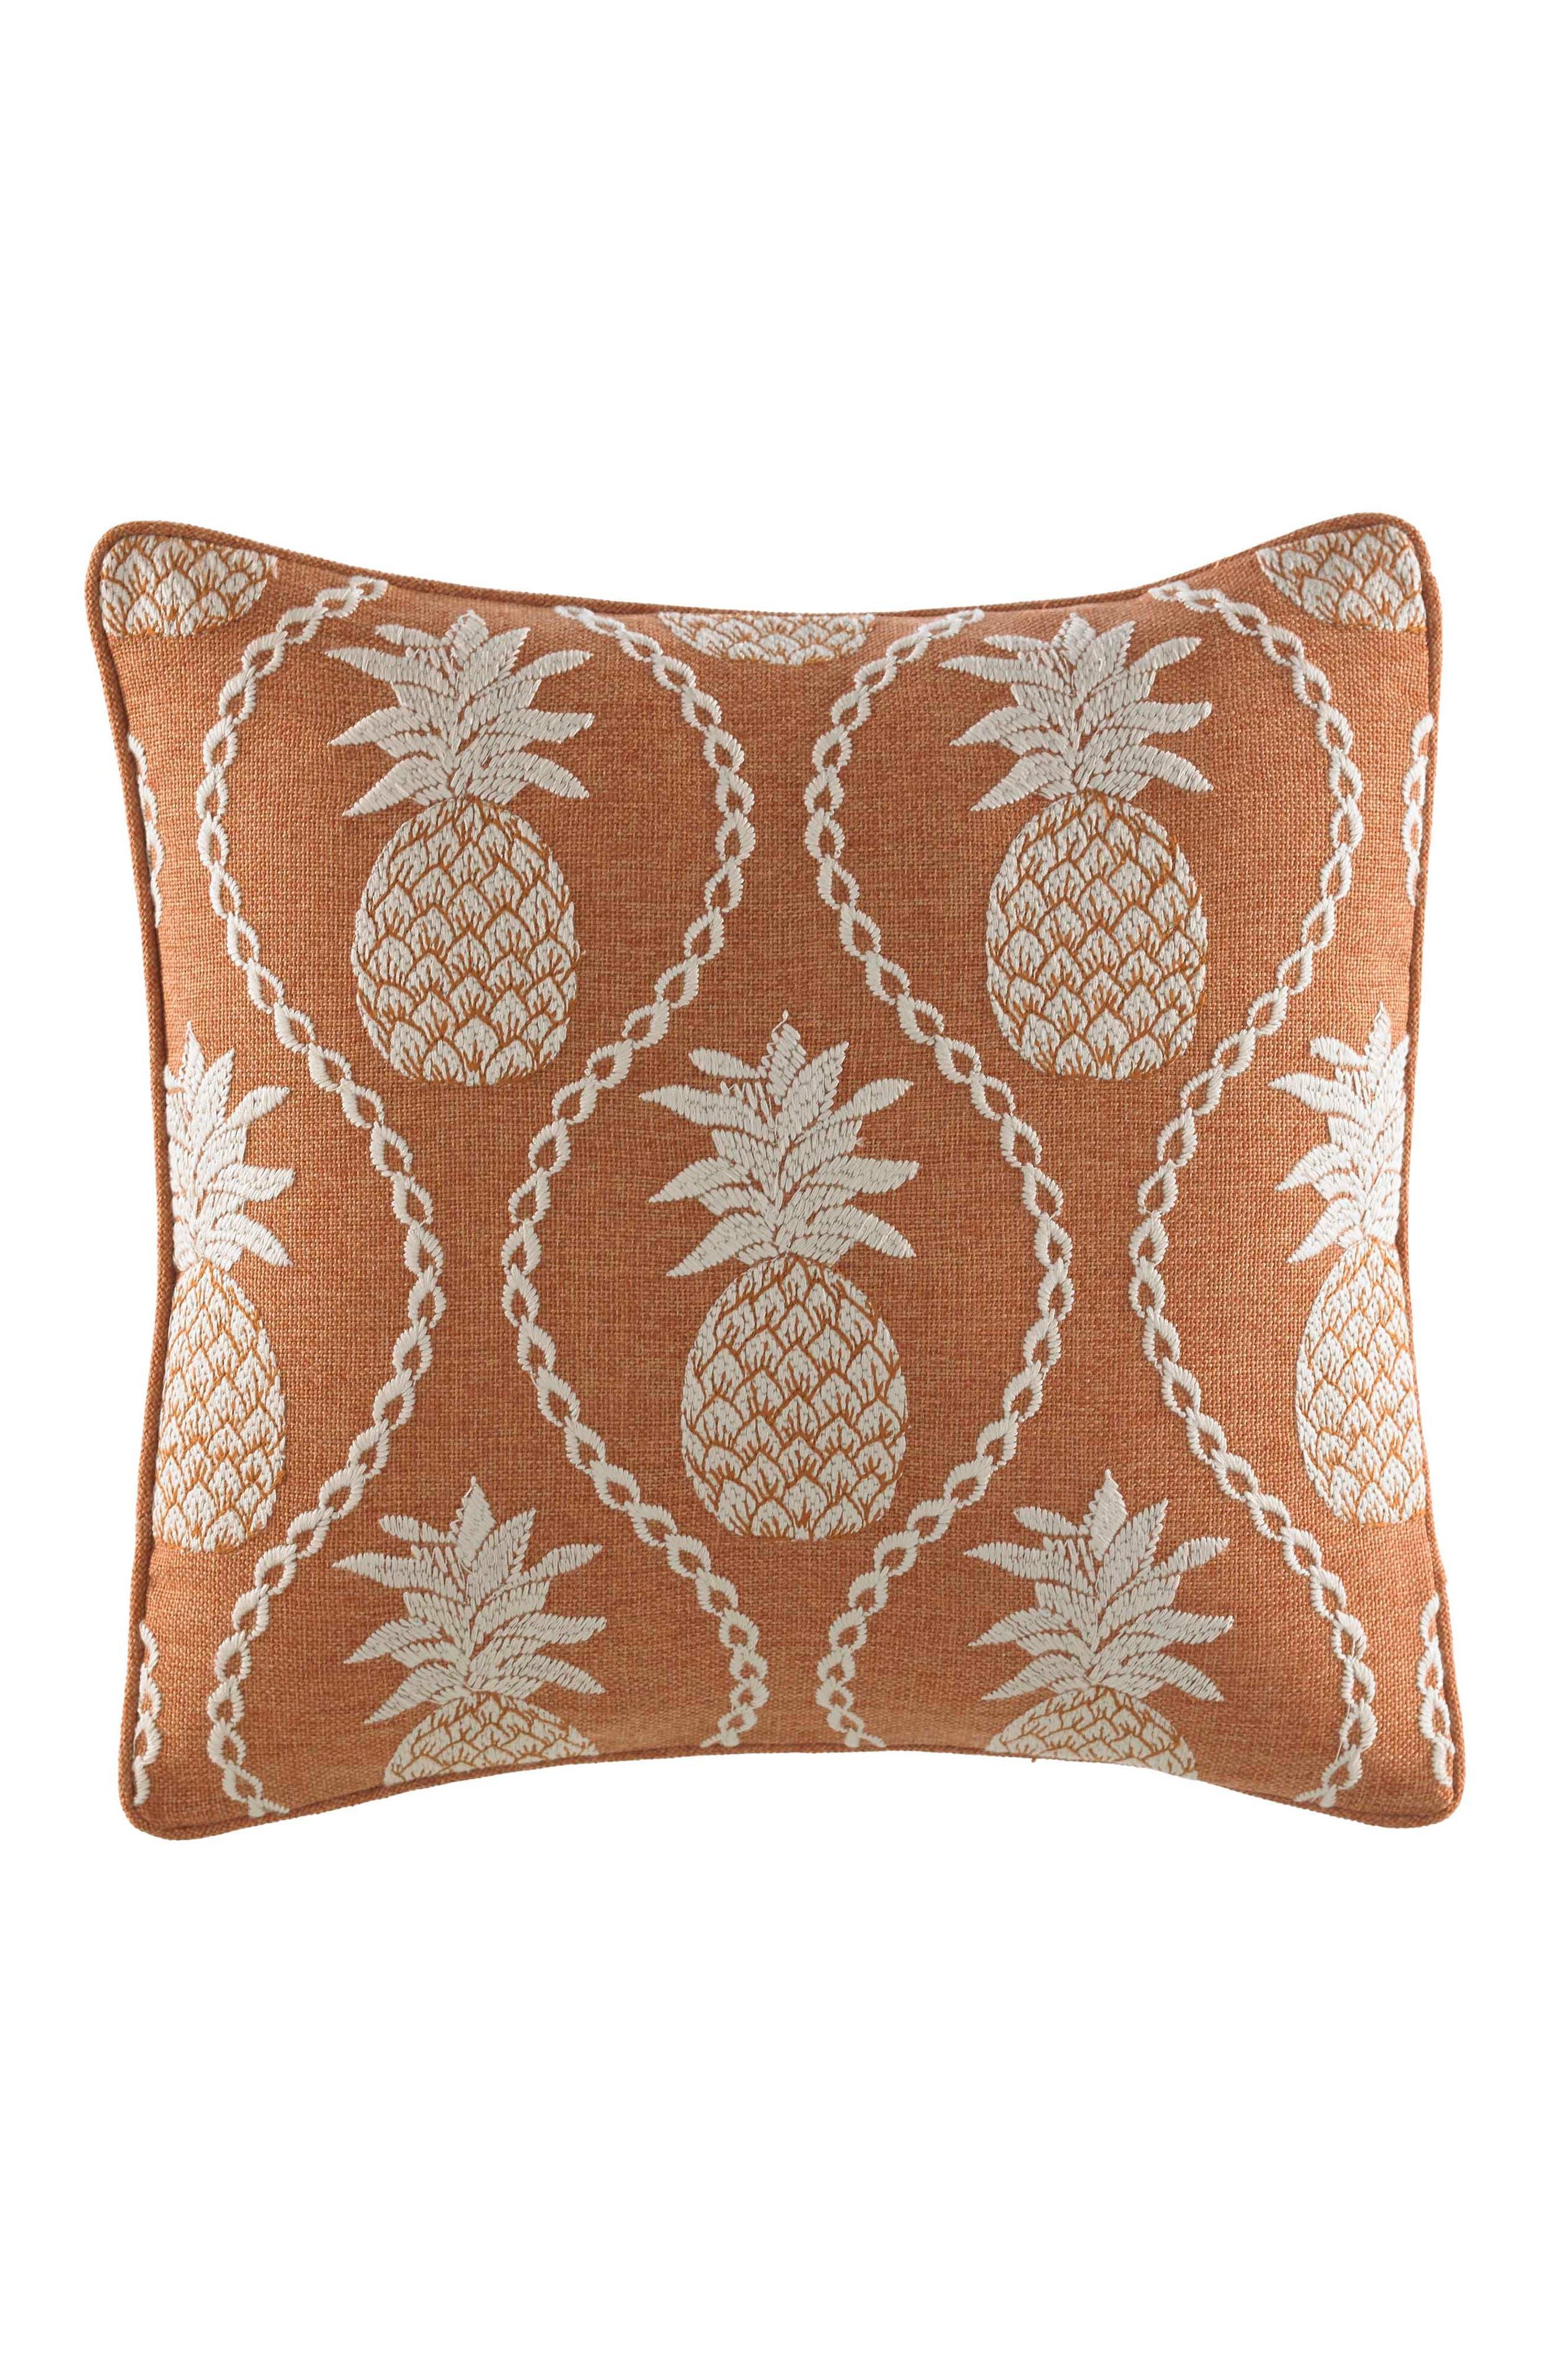 TOMMY BAHAMA Batik Pineapple Accent Pillow, Main, color, BURNT CORAL